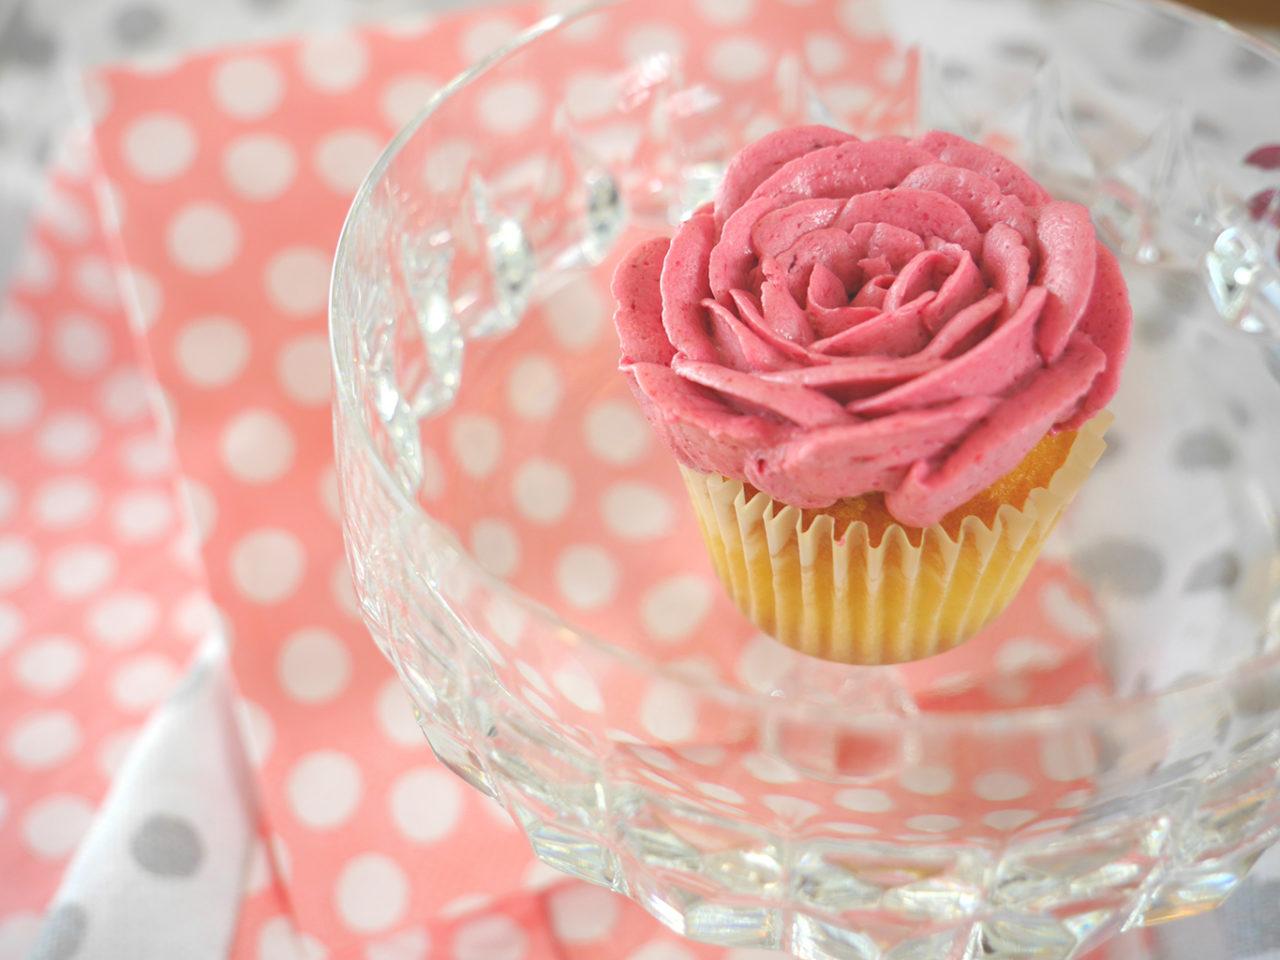 Köln Beste Leckerchen Rosen Cupcakes 2